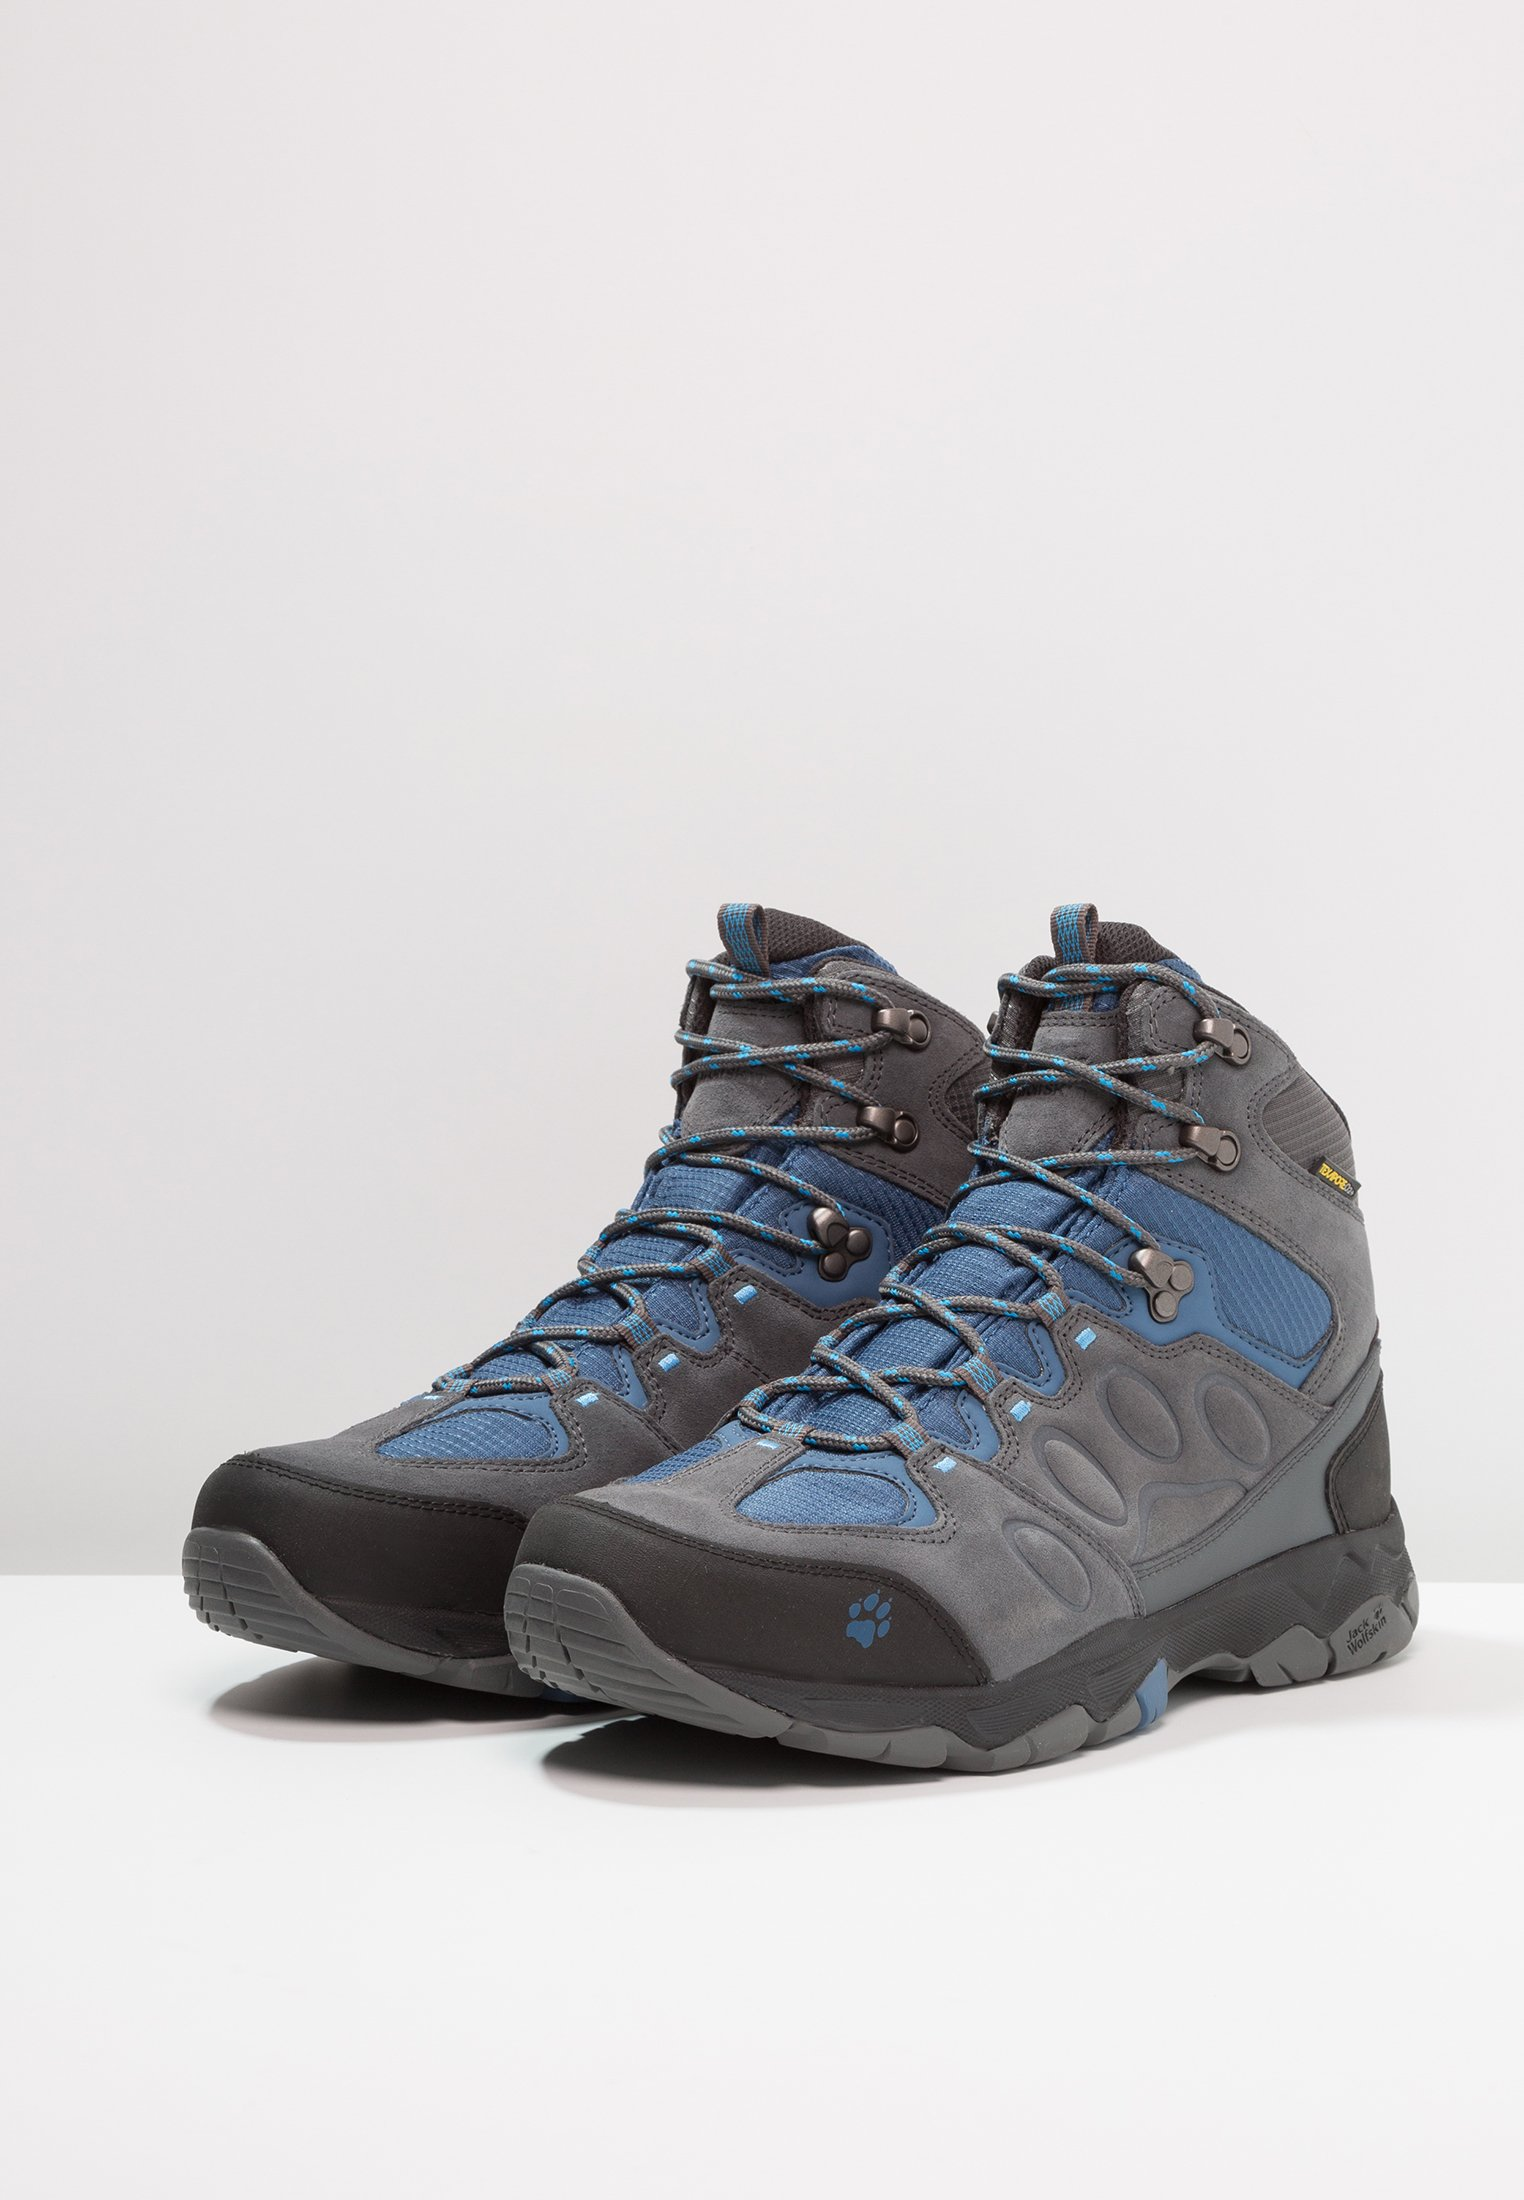 Jack Wolfskin MTN ATTACK 6 TEXAPORE MID - Chaussures de marche ocean wave